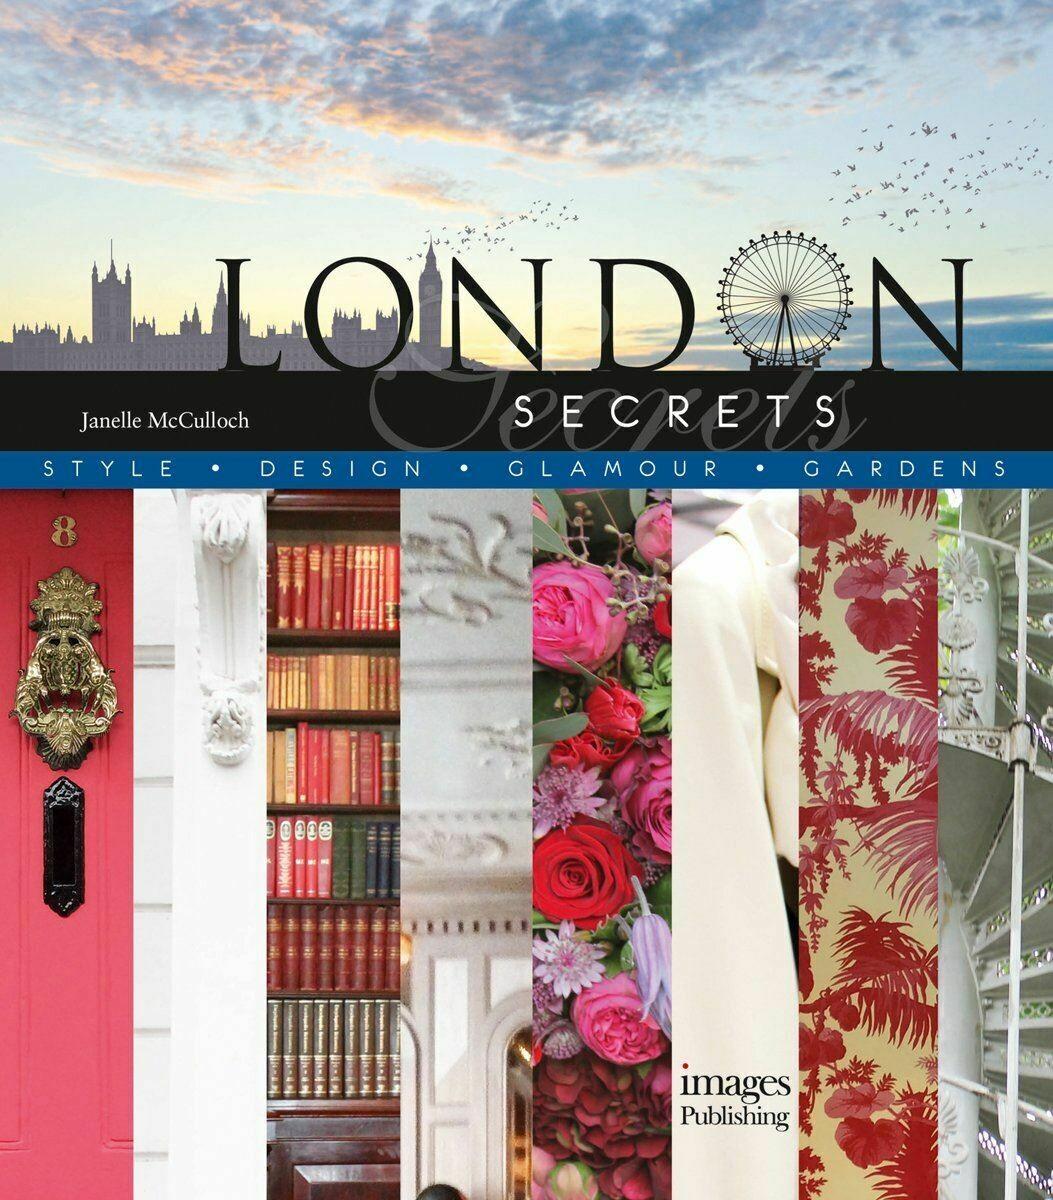 London Secrets